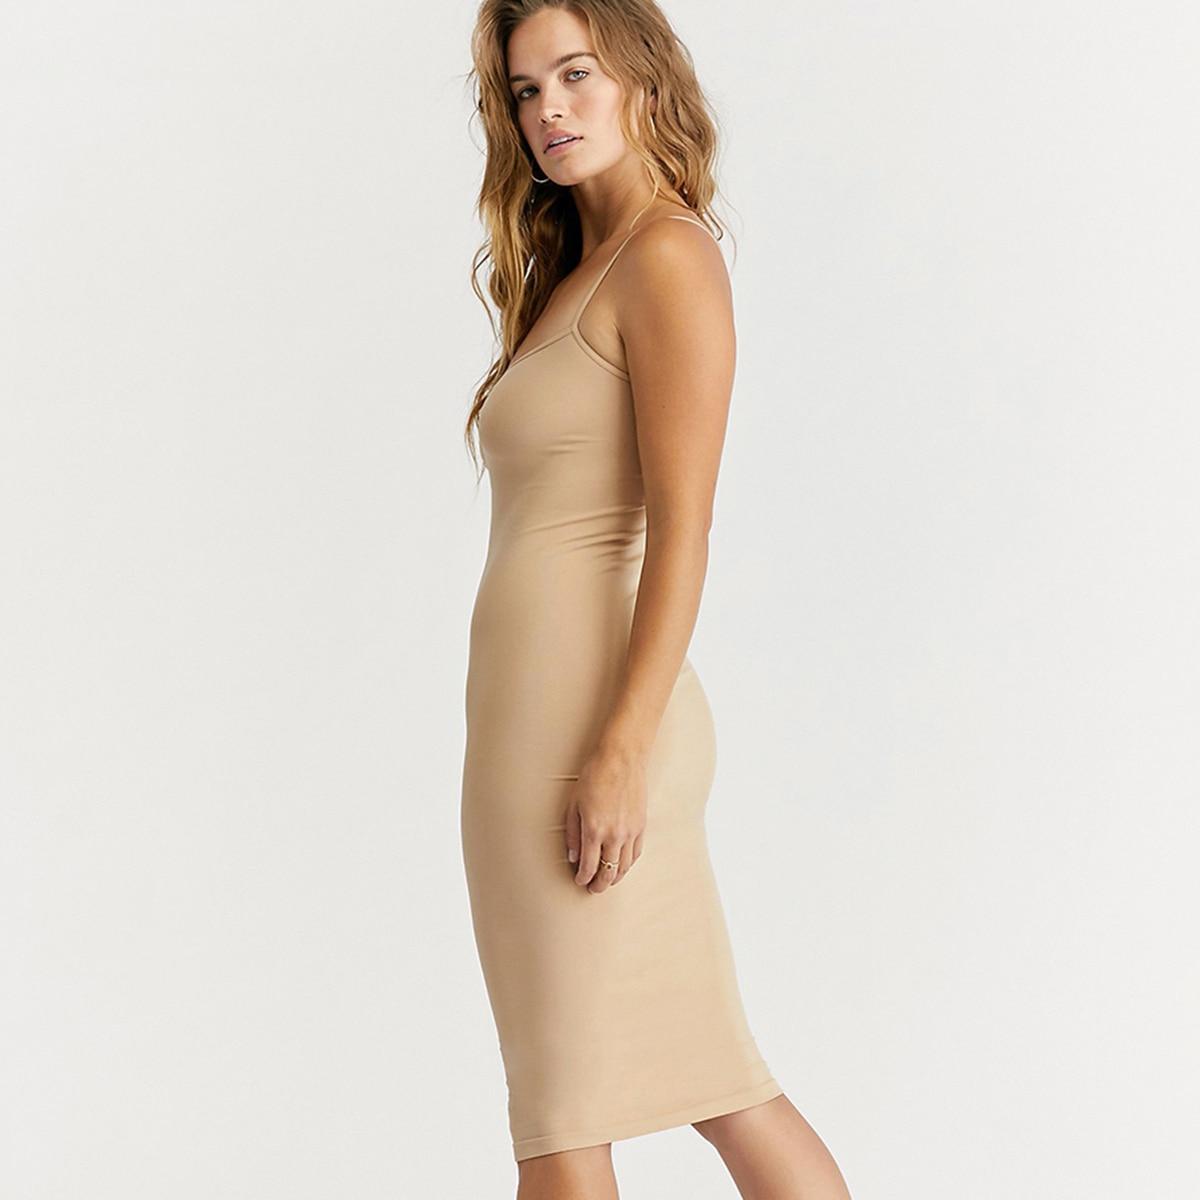 aliexpress.com - Seamless Nude Slip Dress 2021 Summer Autumn Women Adjustable Strap Sexy Vestidos Stretchy Bodycon Slim Midi Dress Underdress